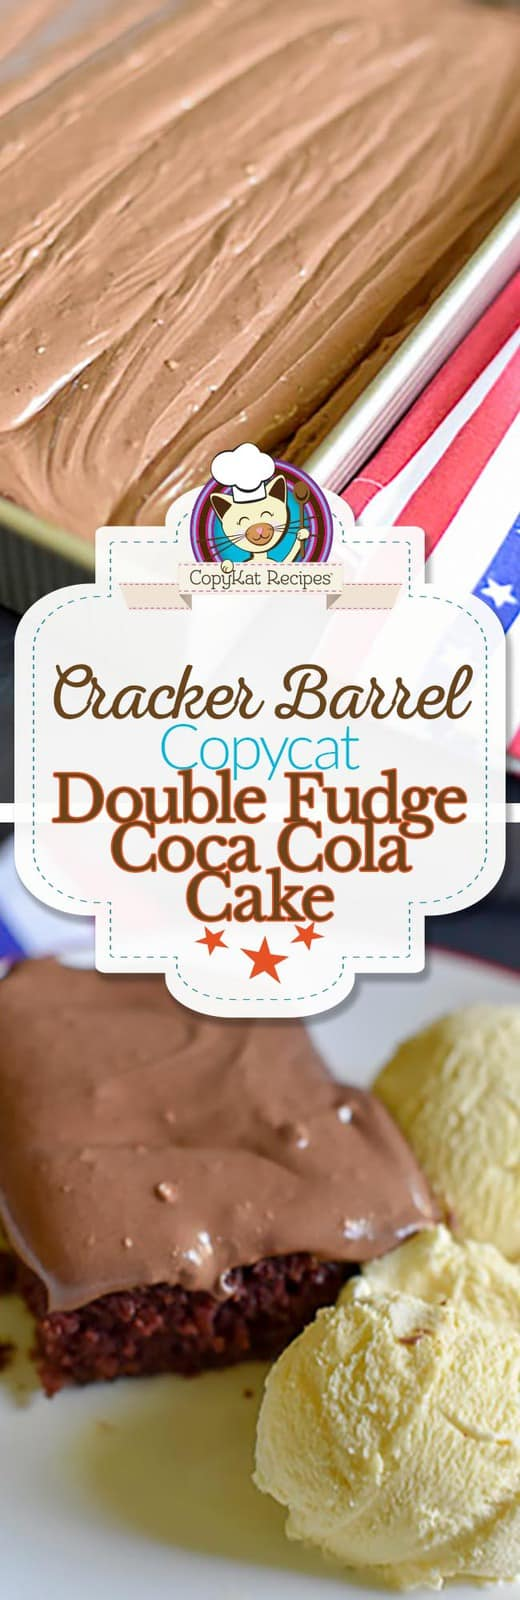 How To Make Coca Cola Cake Like Cracker Barrel